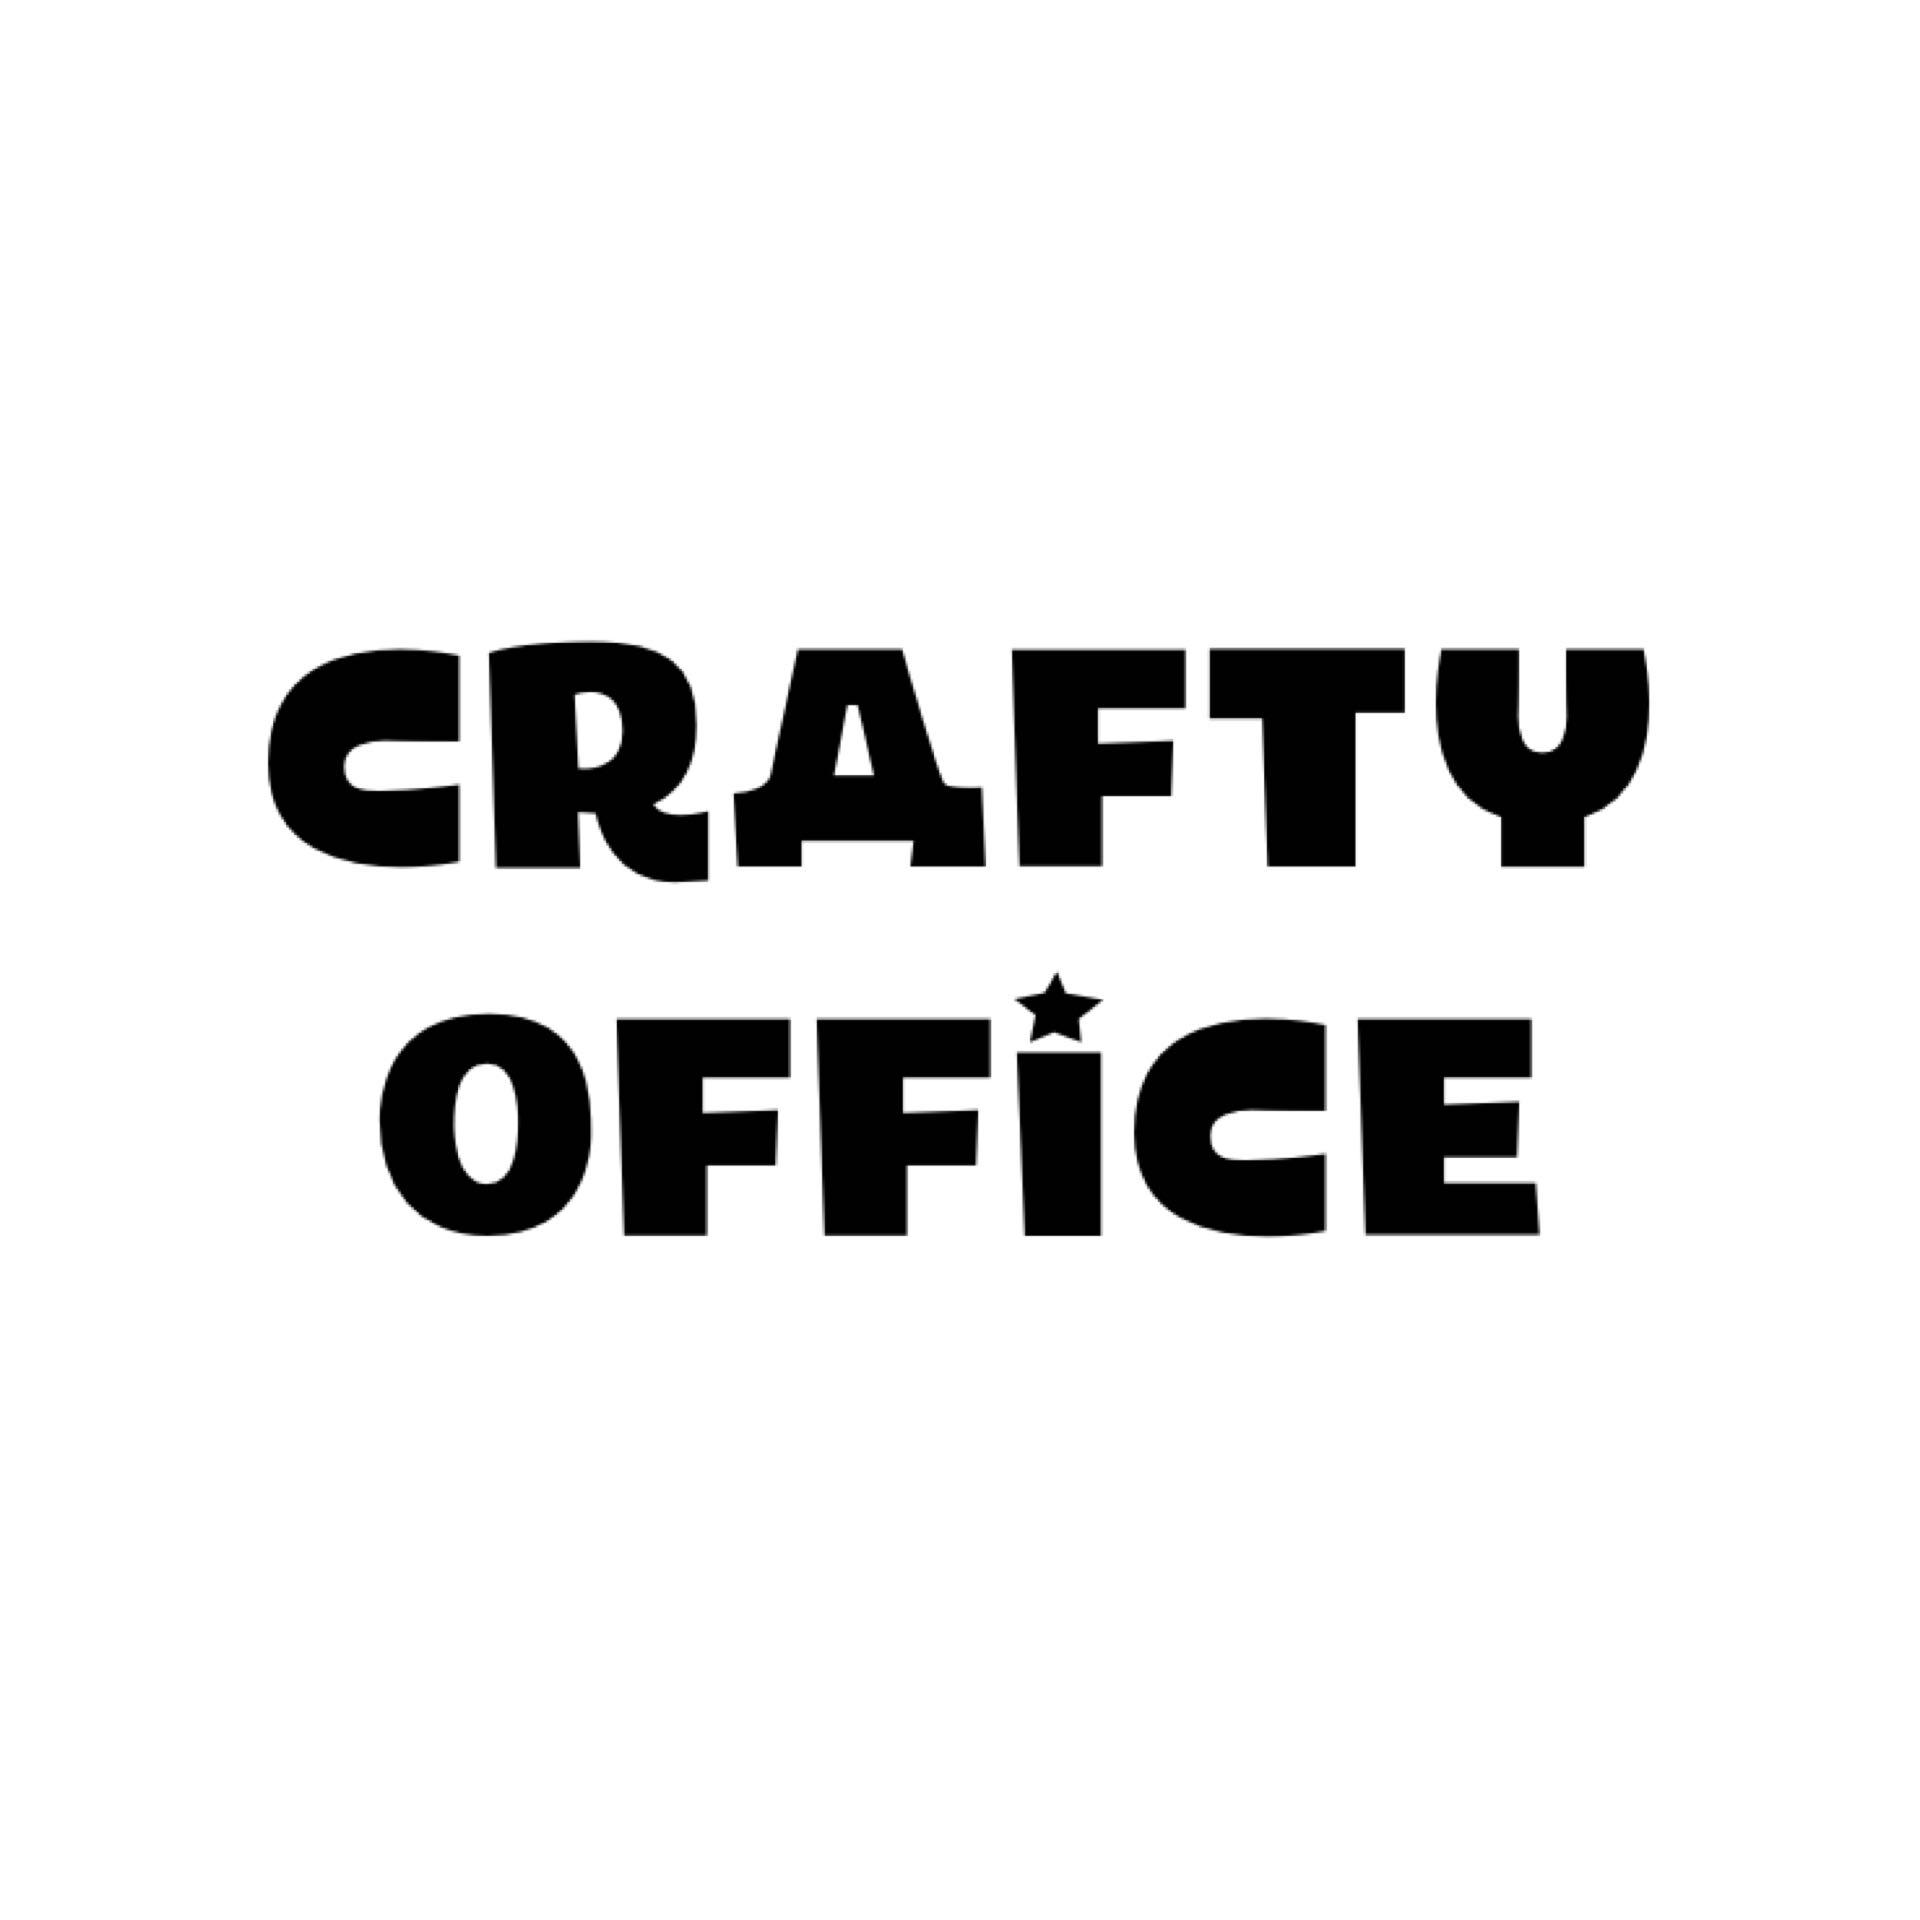 crafty_office